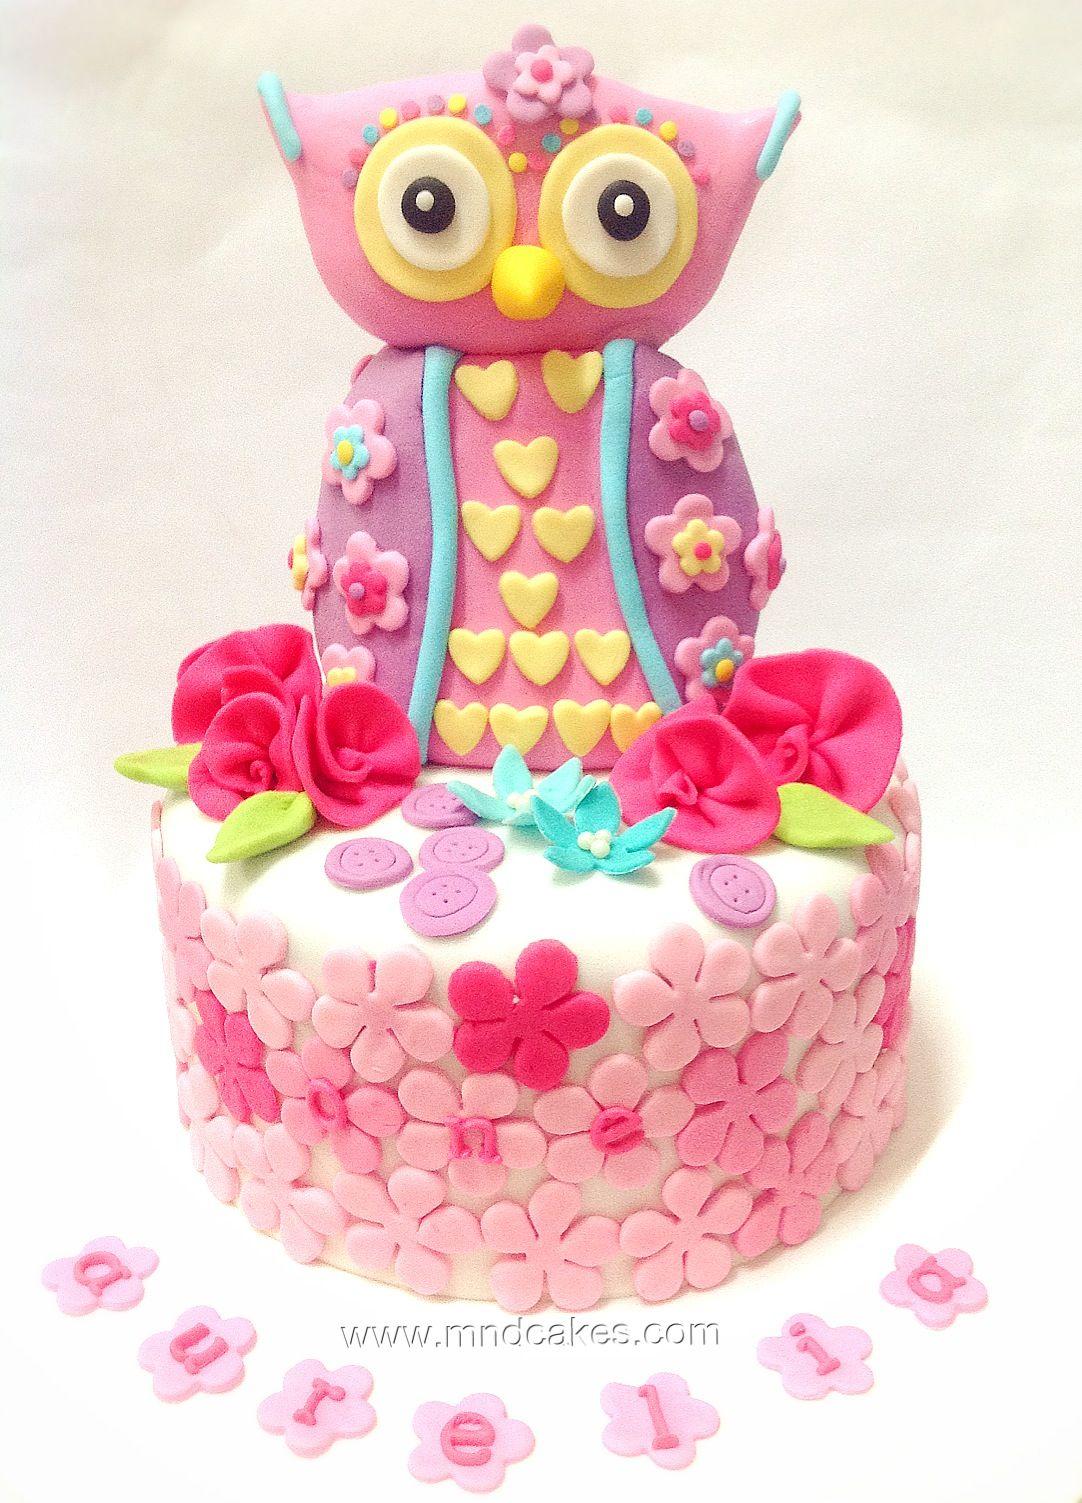 Mom & Daughter Cakes: Owl Cake For 1st Birthday